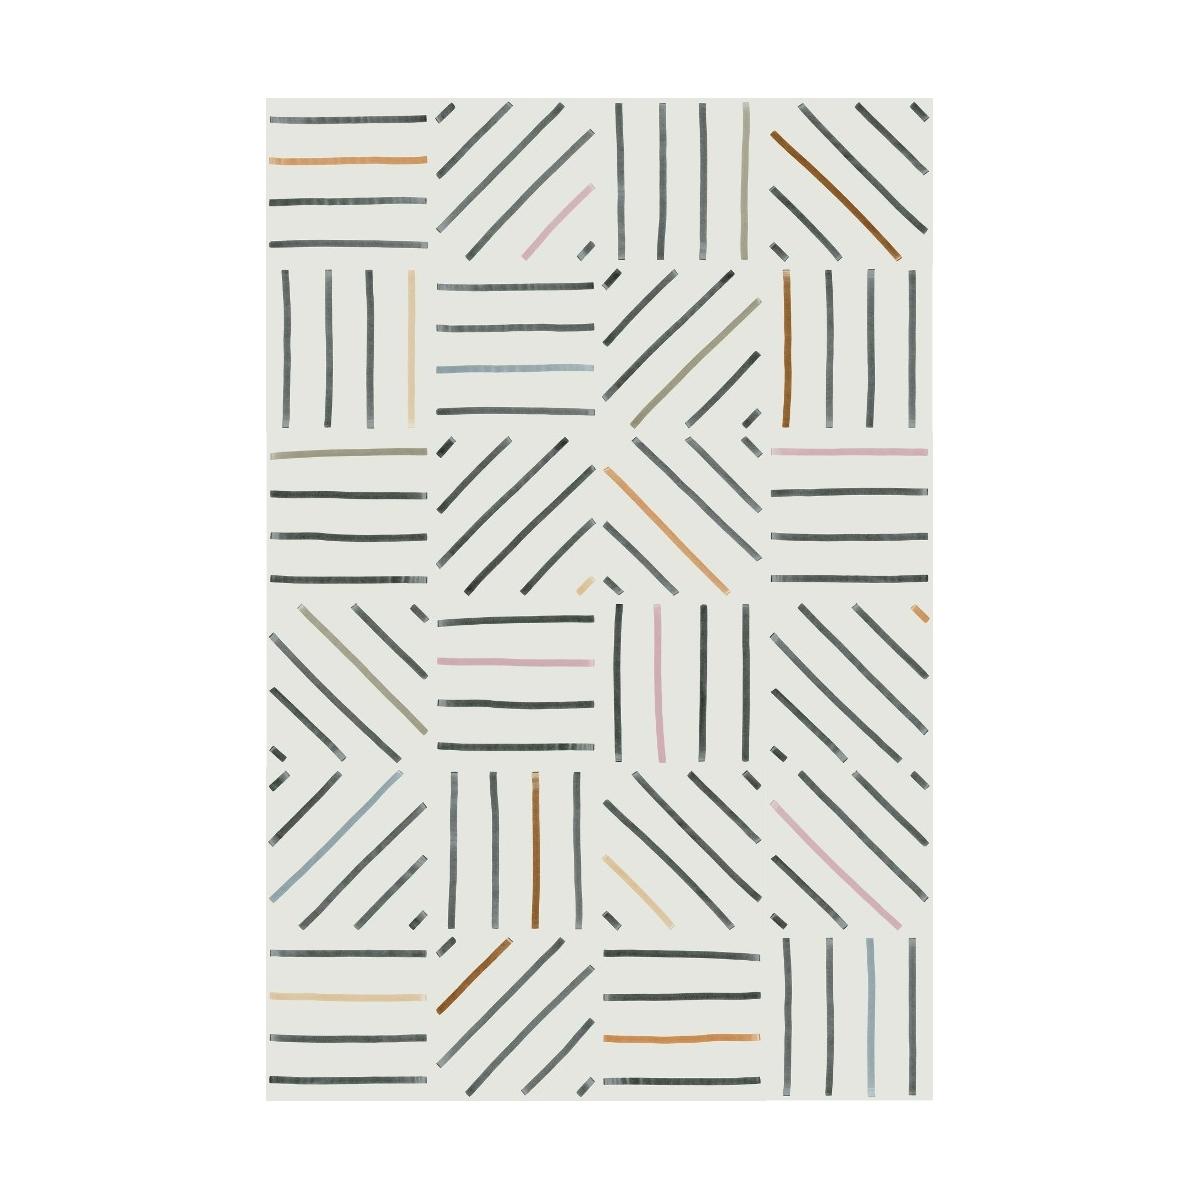 Tiebele 20x20 (m2) - Serie Maori - Marca Vives